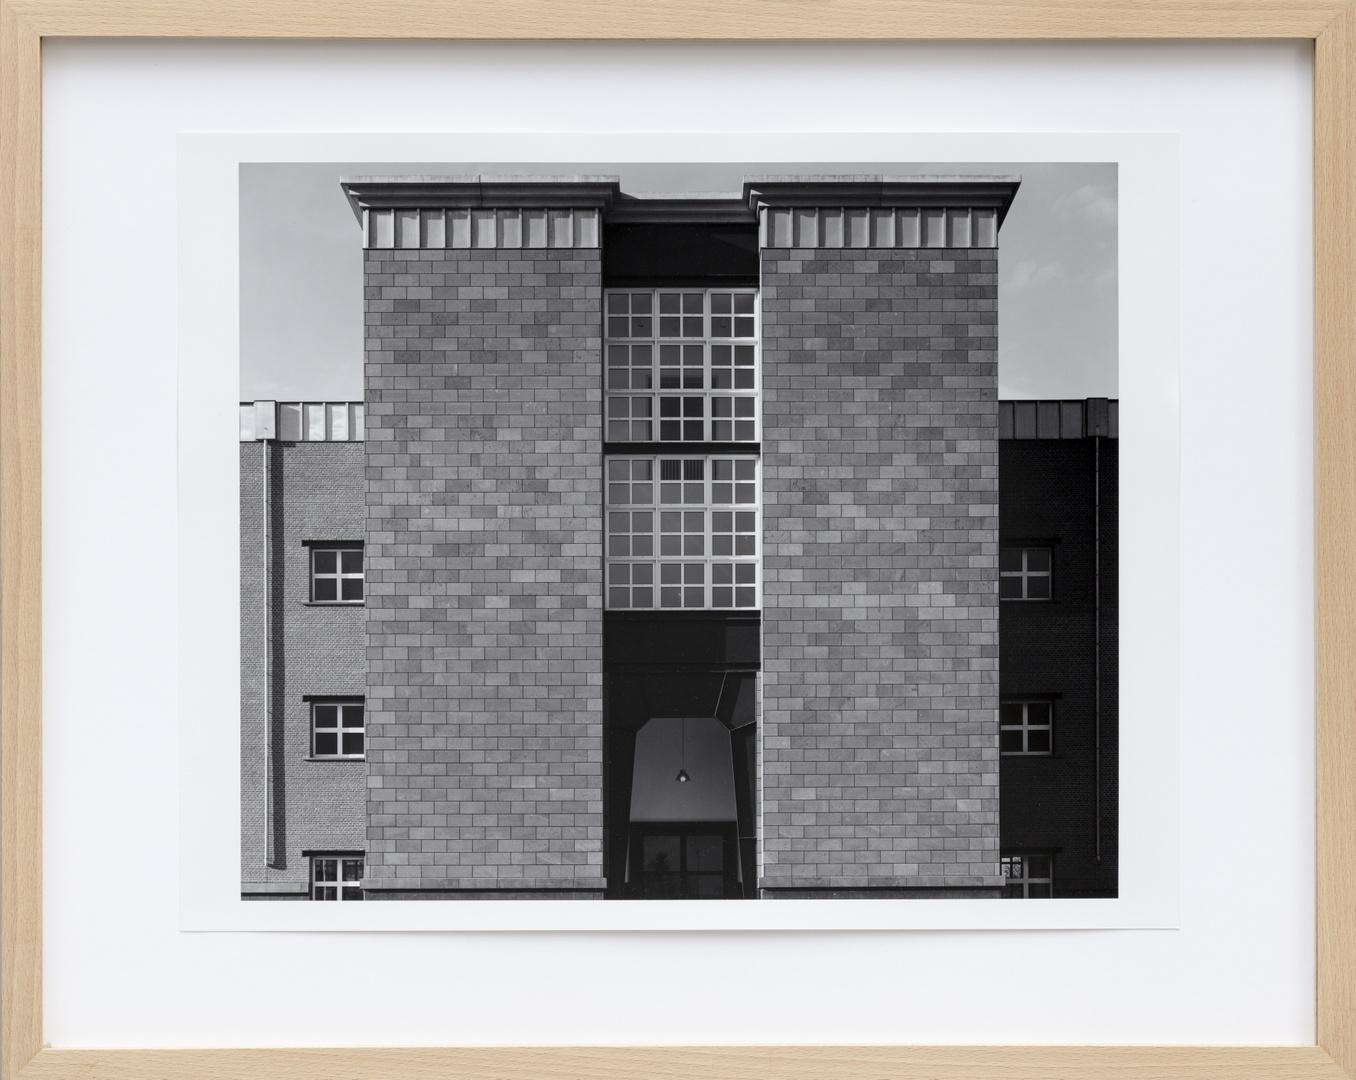 Bouw Bonnefantenmuseum 1992-1994 ; Hoofdingang